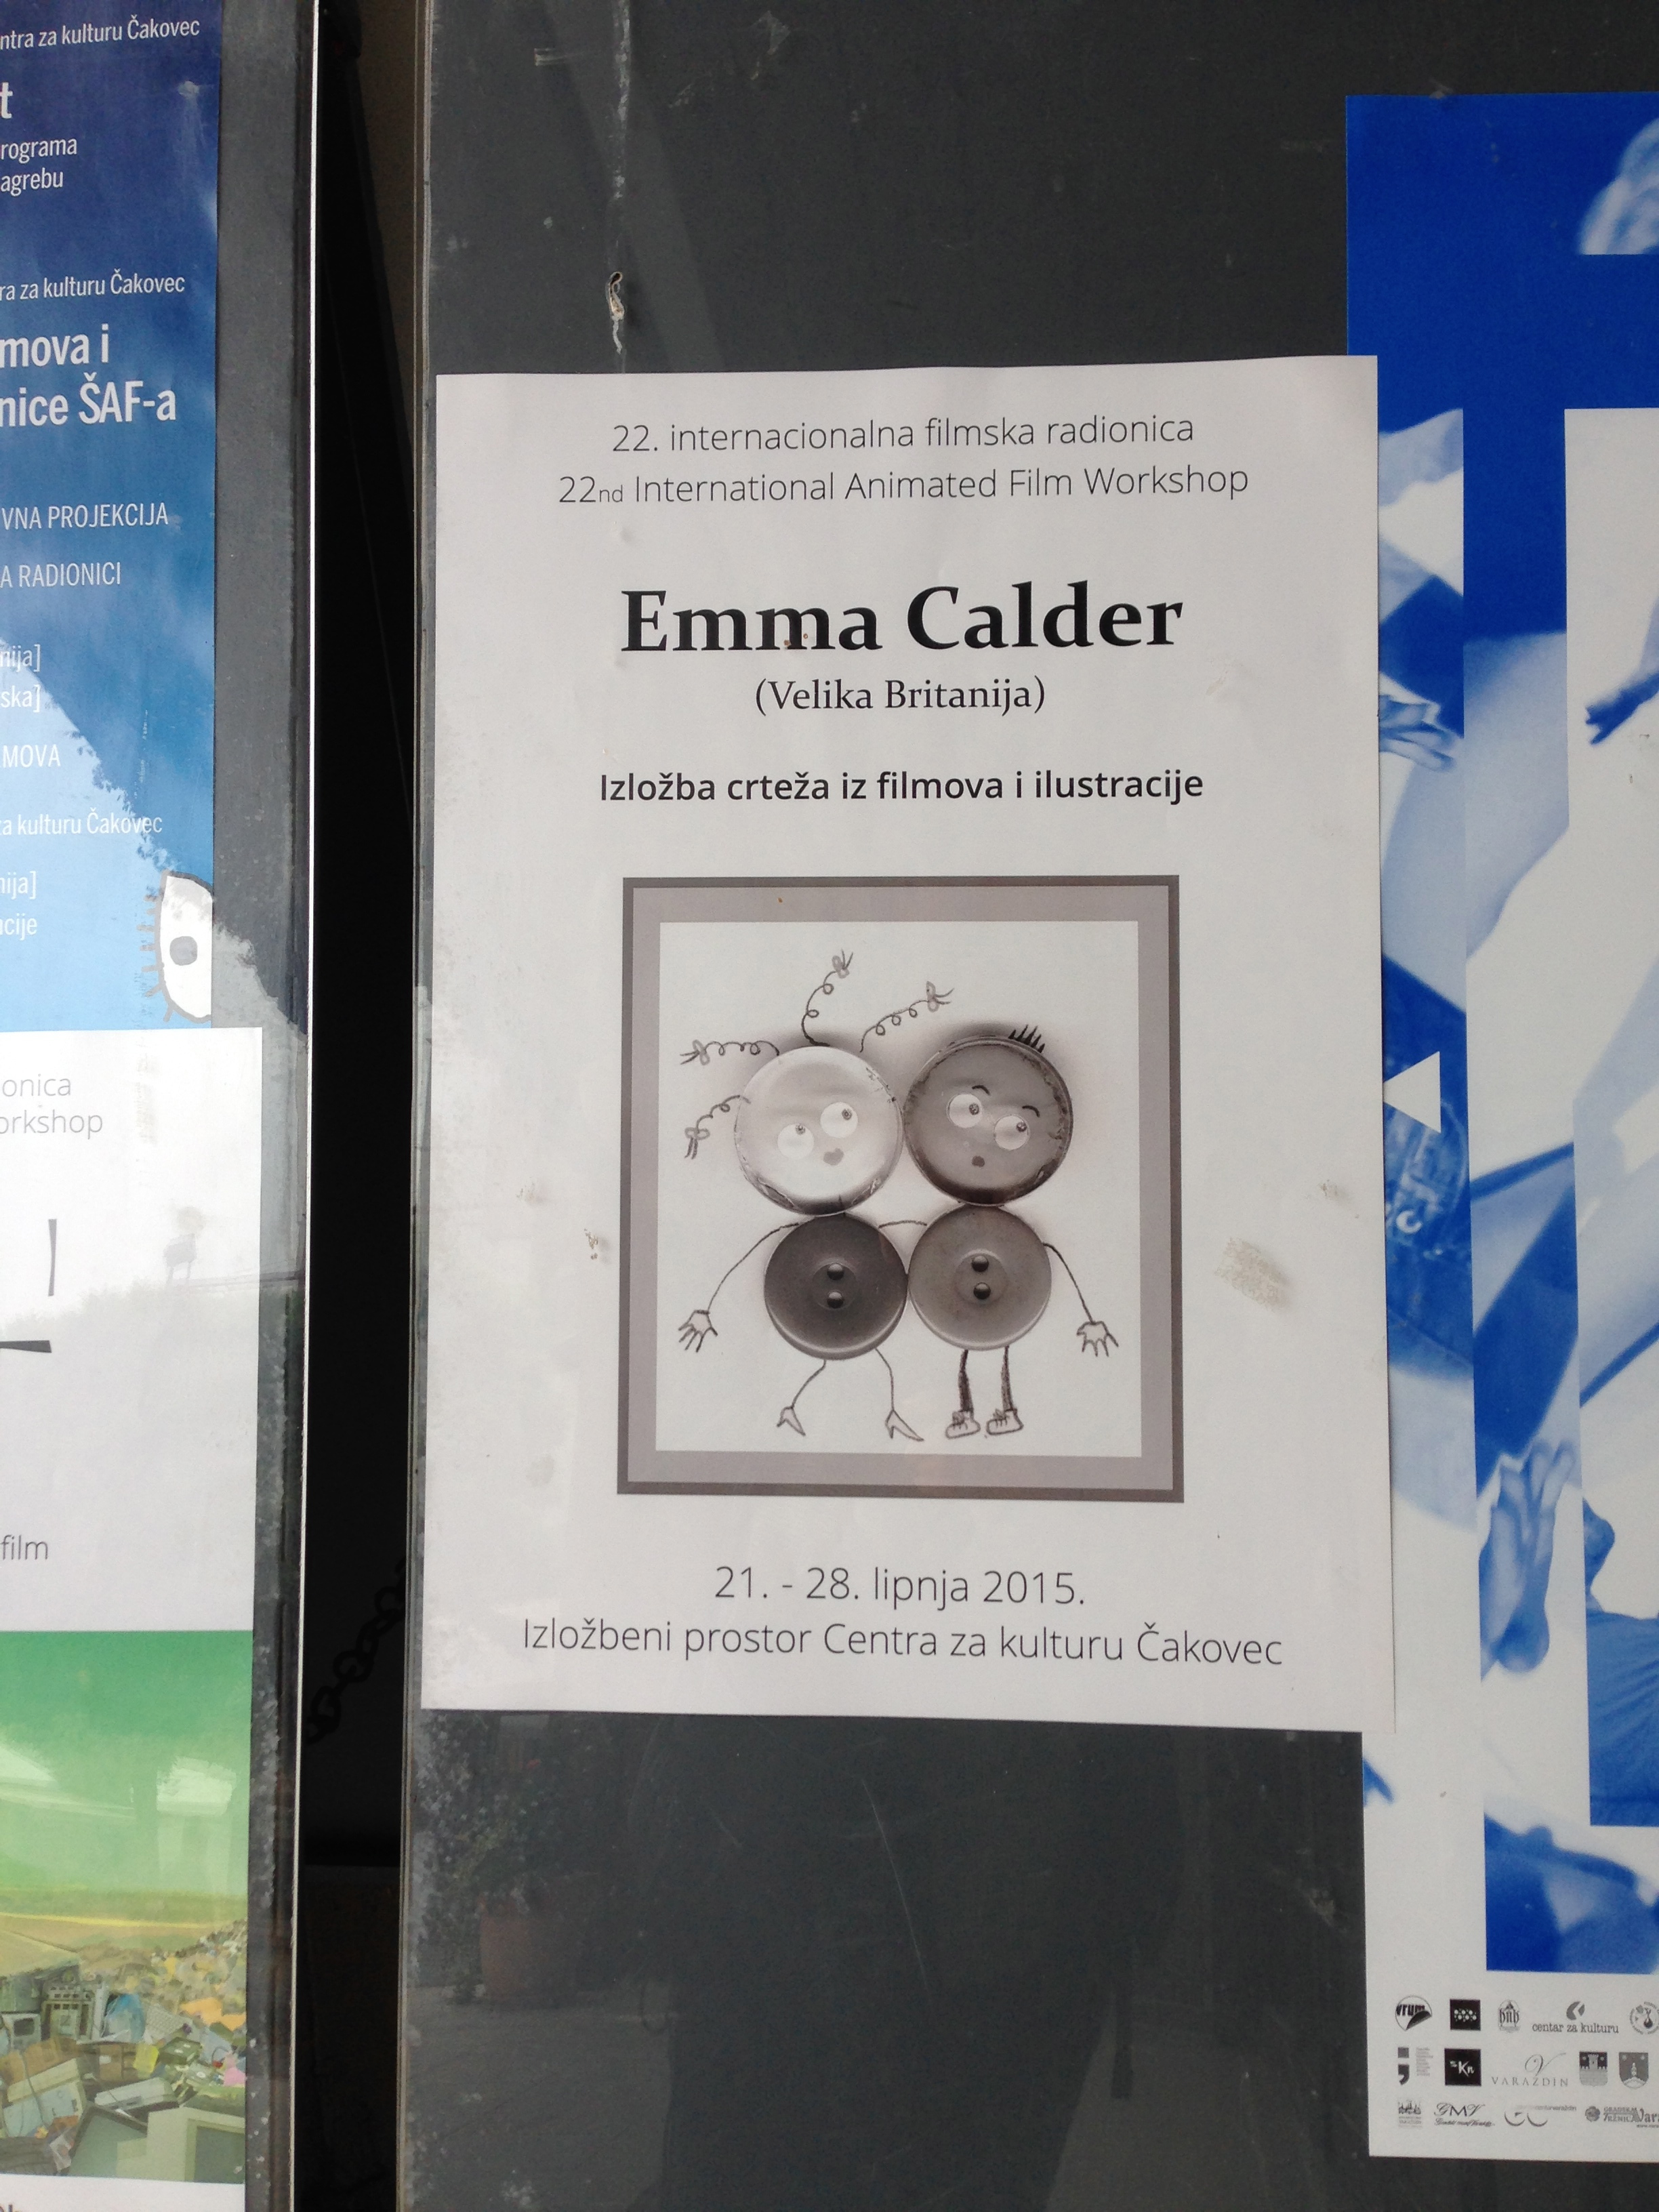 Emma Calder Exhibition Poster